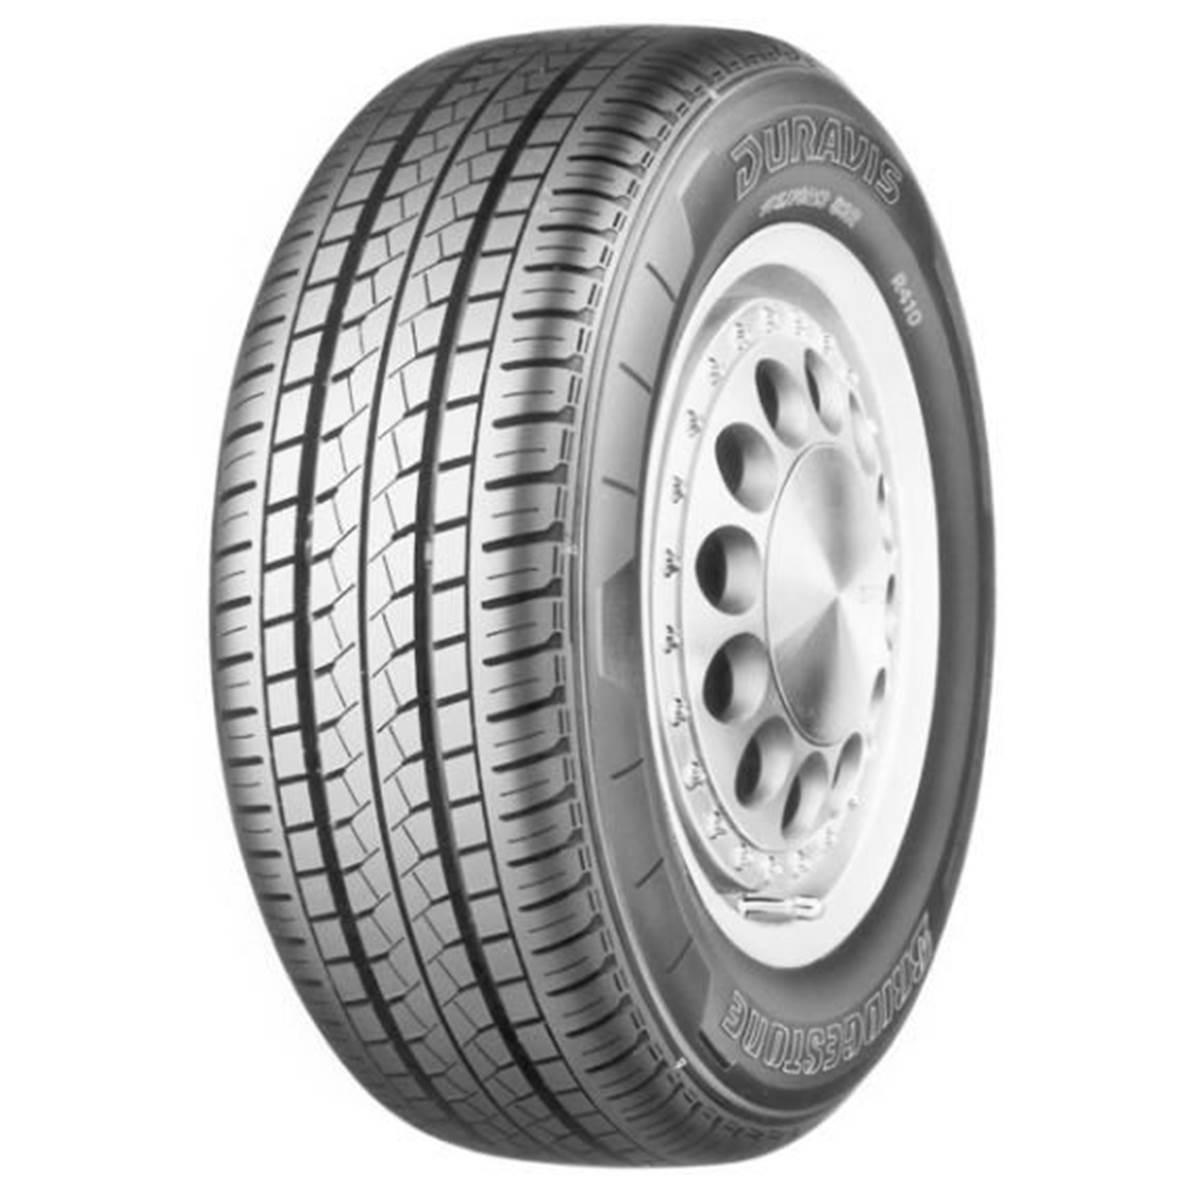 Pneu Bridgestone 165/80R13 87R DURAVIS R410